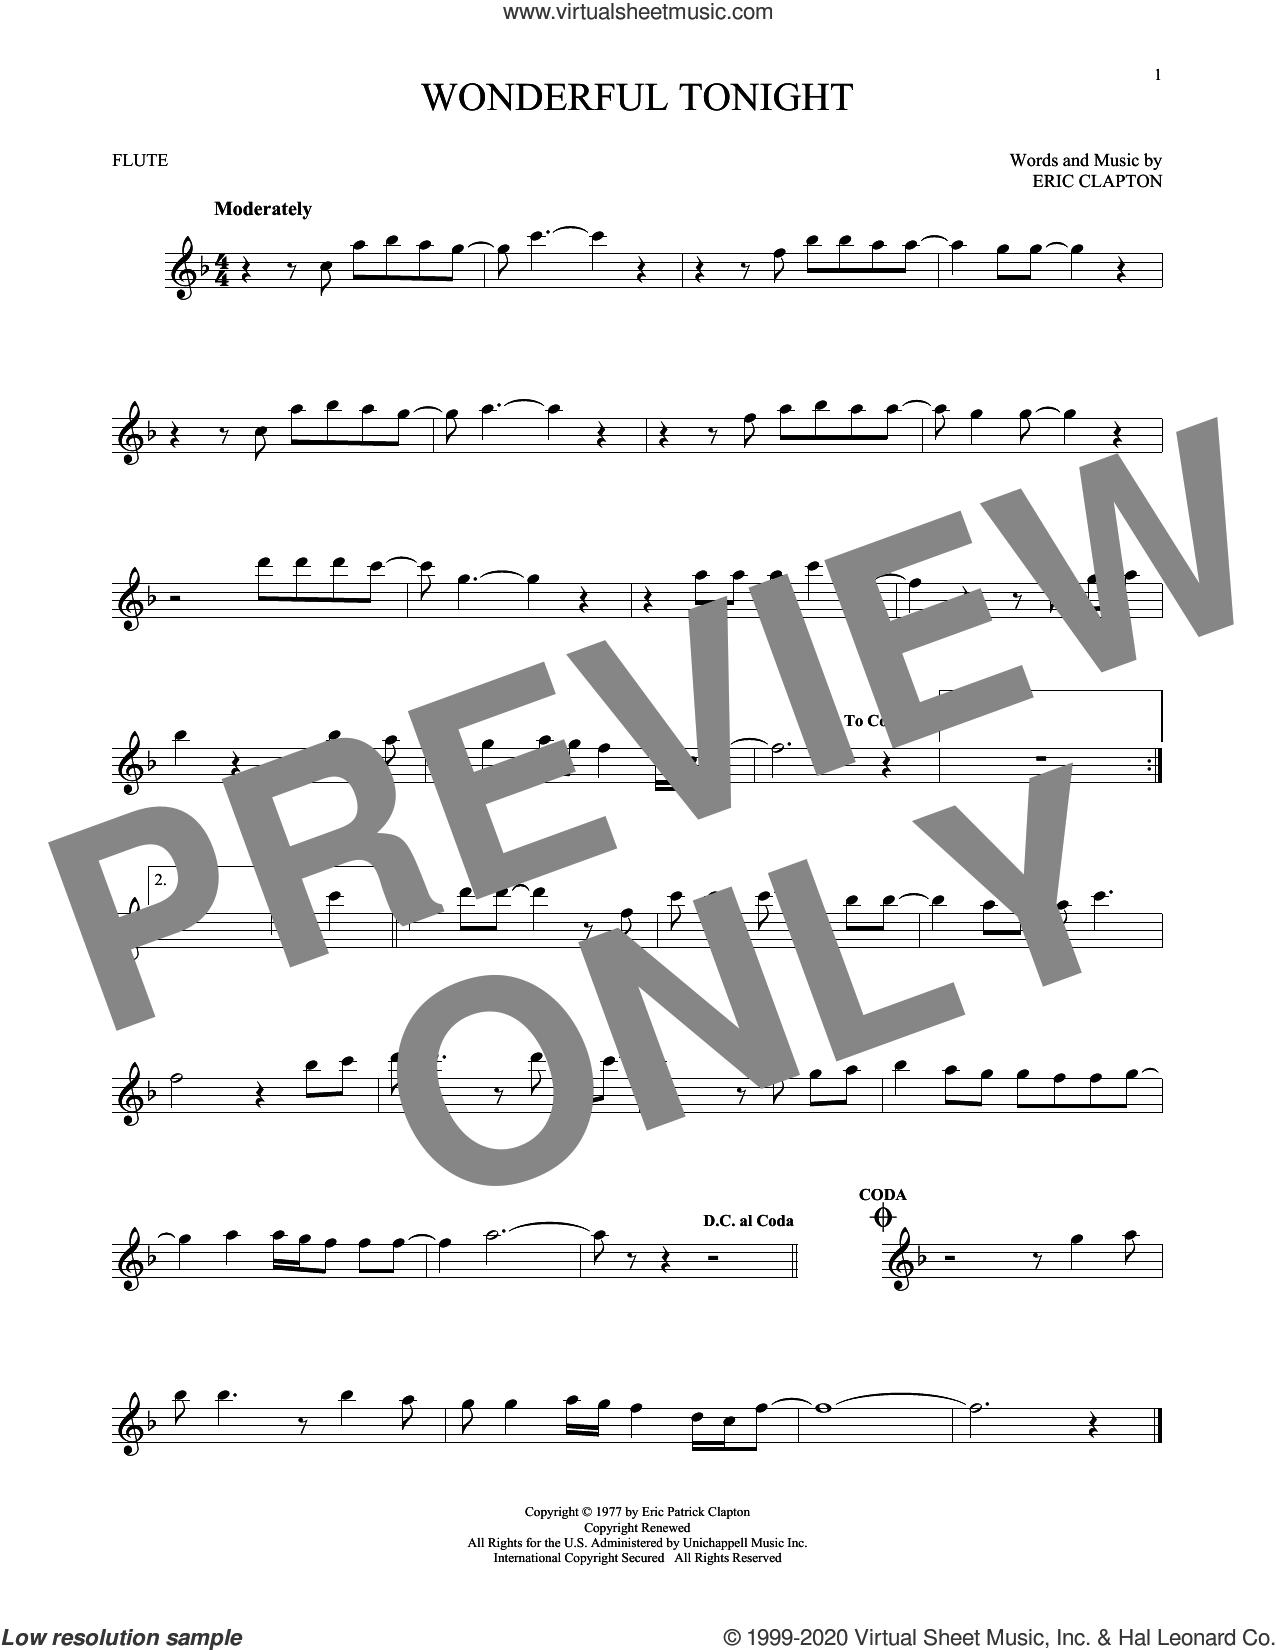 Wonderful Tonight sheet music for flute solo by Eric Clapton and David Kersh, wedding score, intermediate skill level